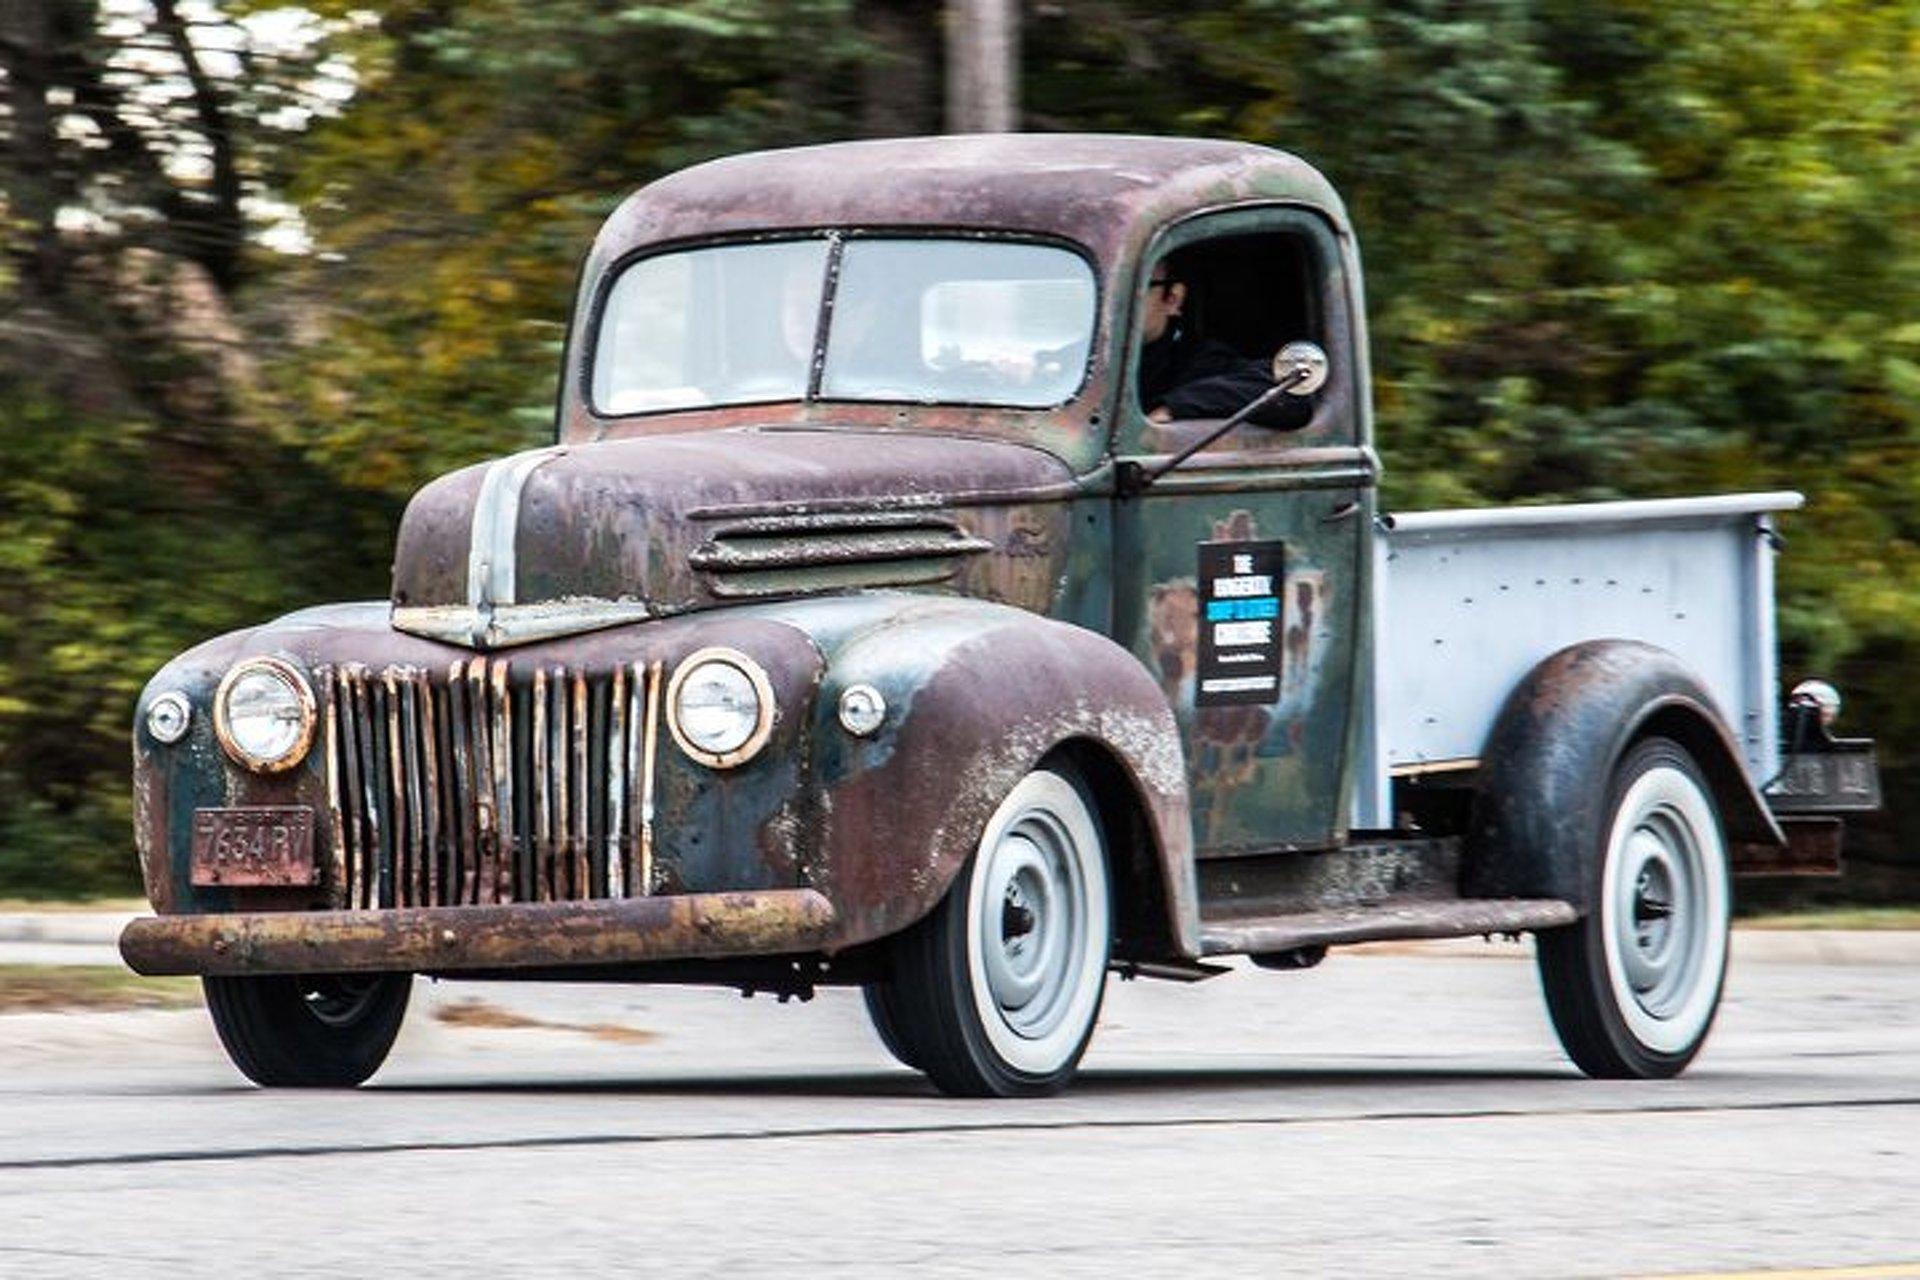 Watch A Derelict Ford Truck Get Restored Using Just Swap Meet Parts